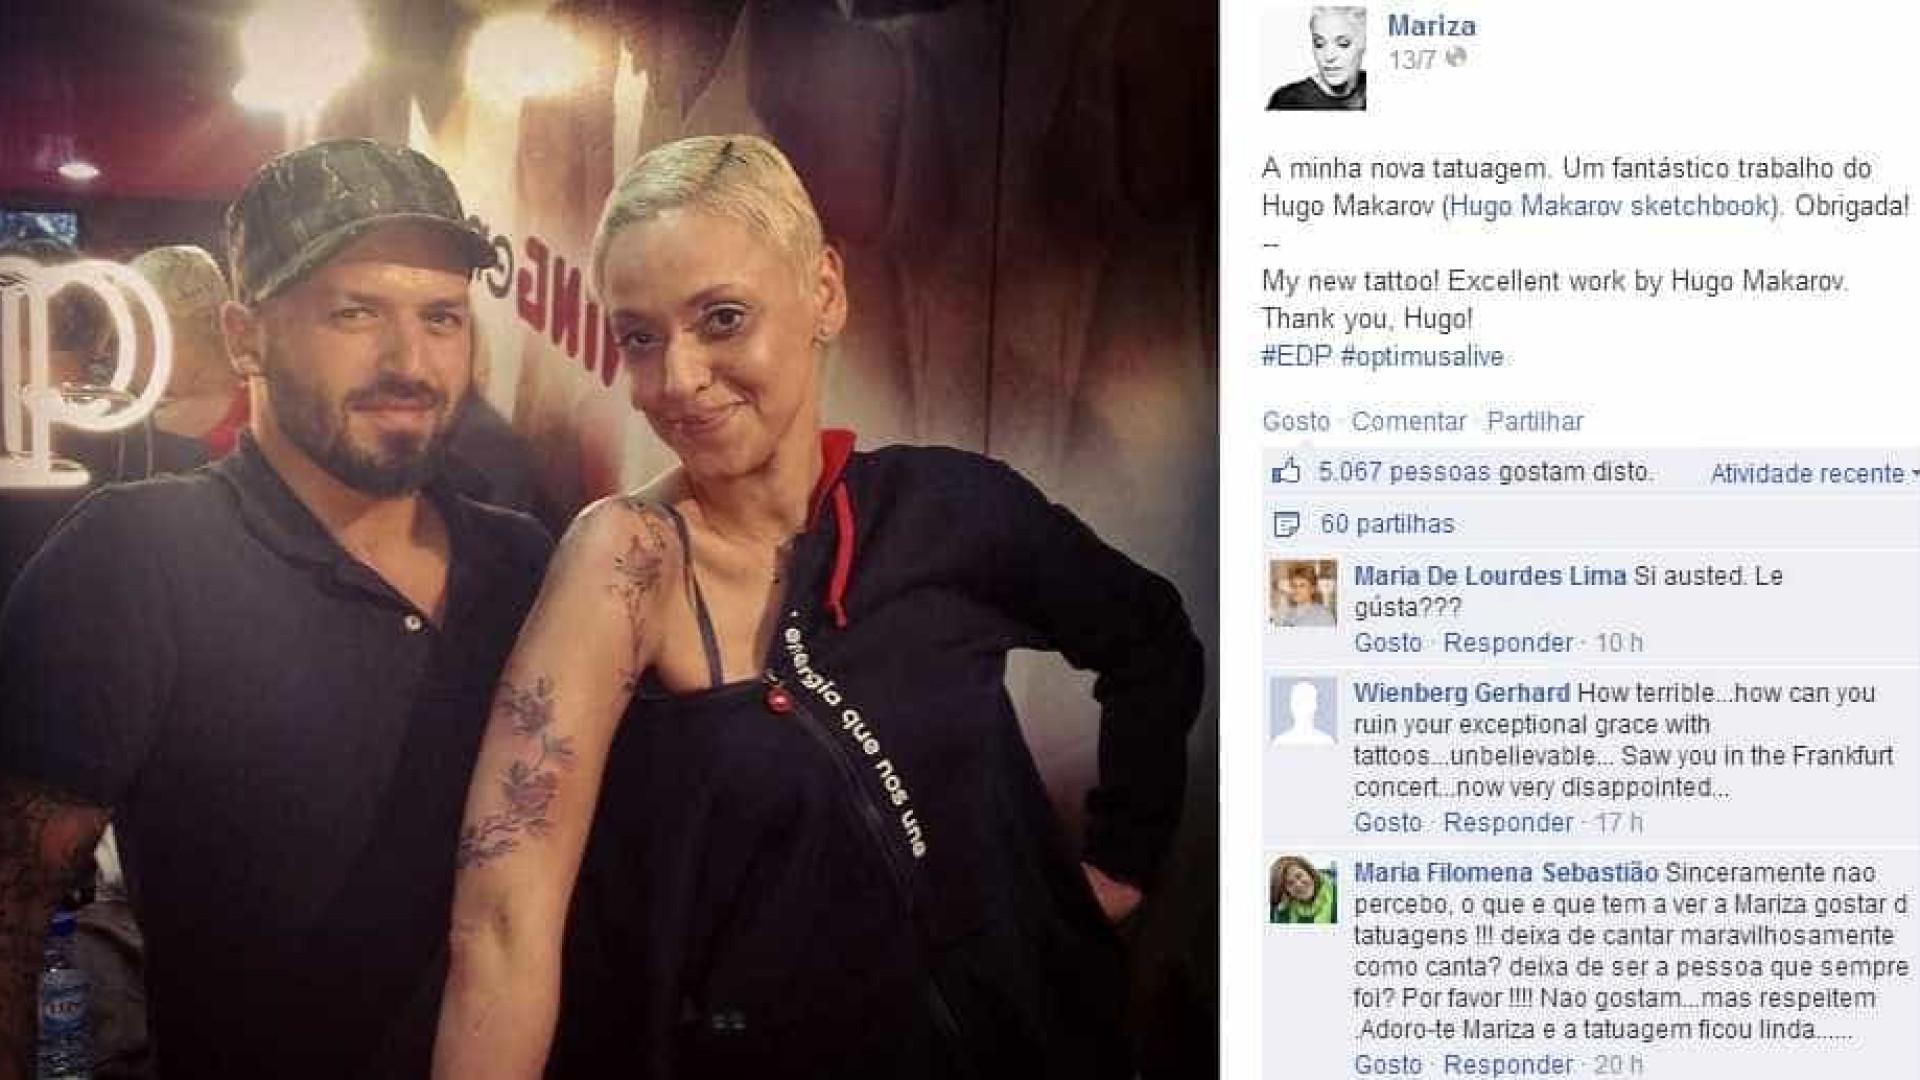 Mariza Admite Ser Fã De Tatuagens